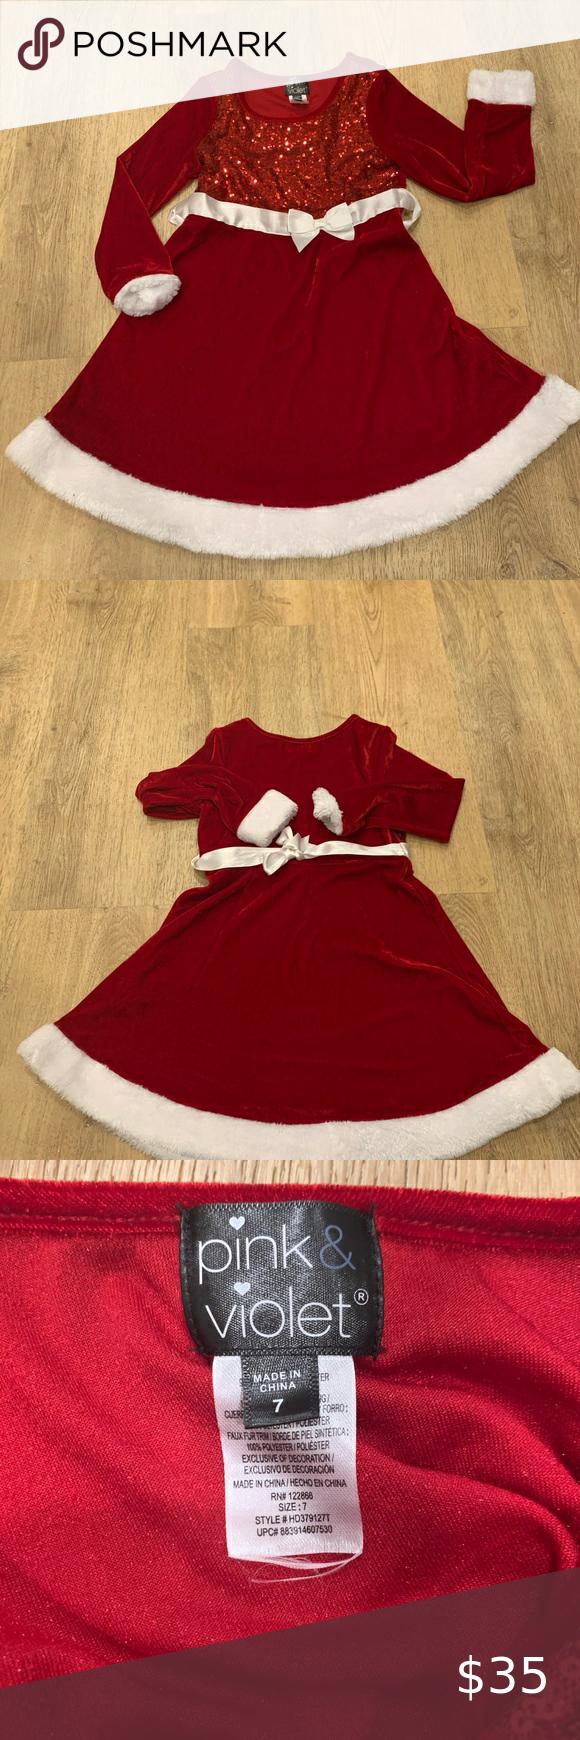 10++ Girls size 7 christmas dress ideas in 2021